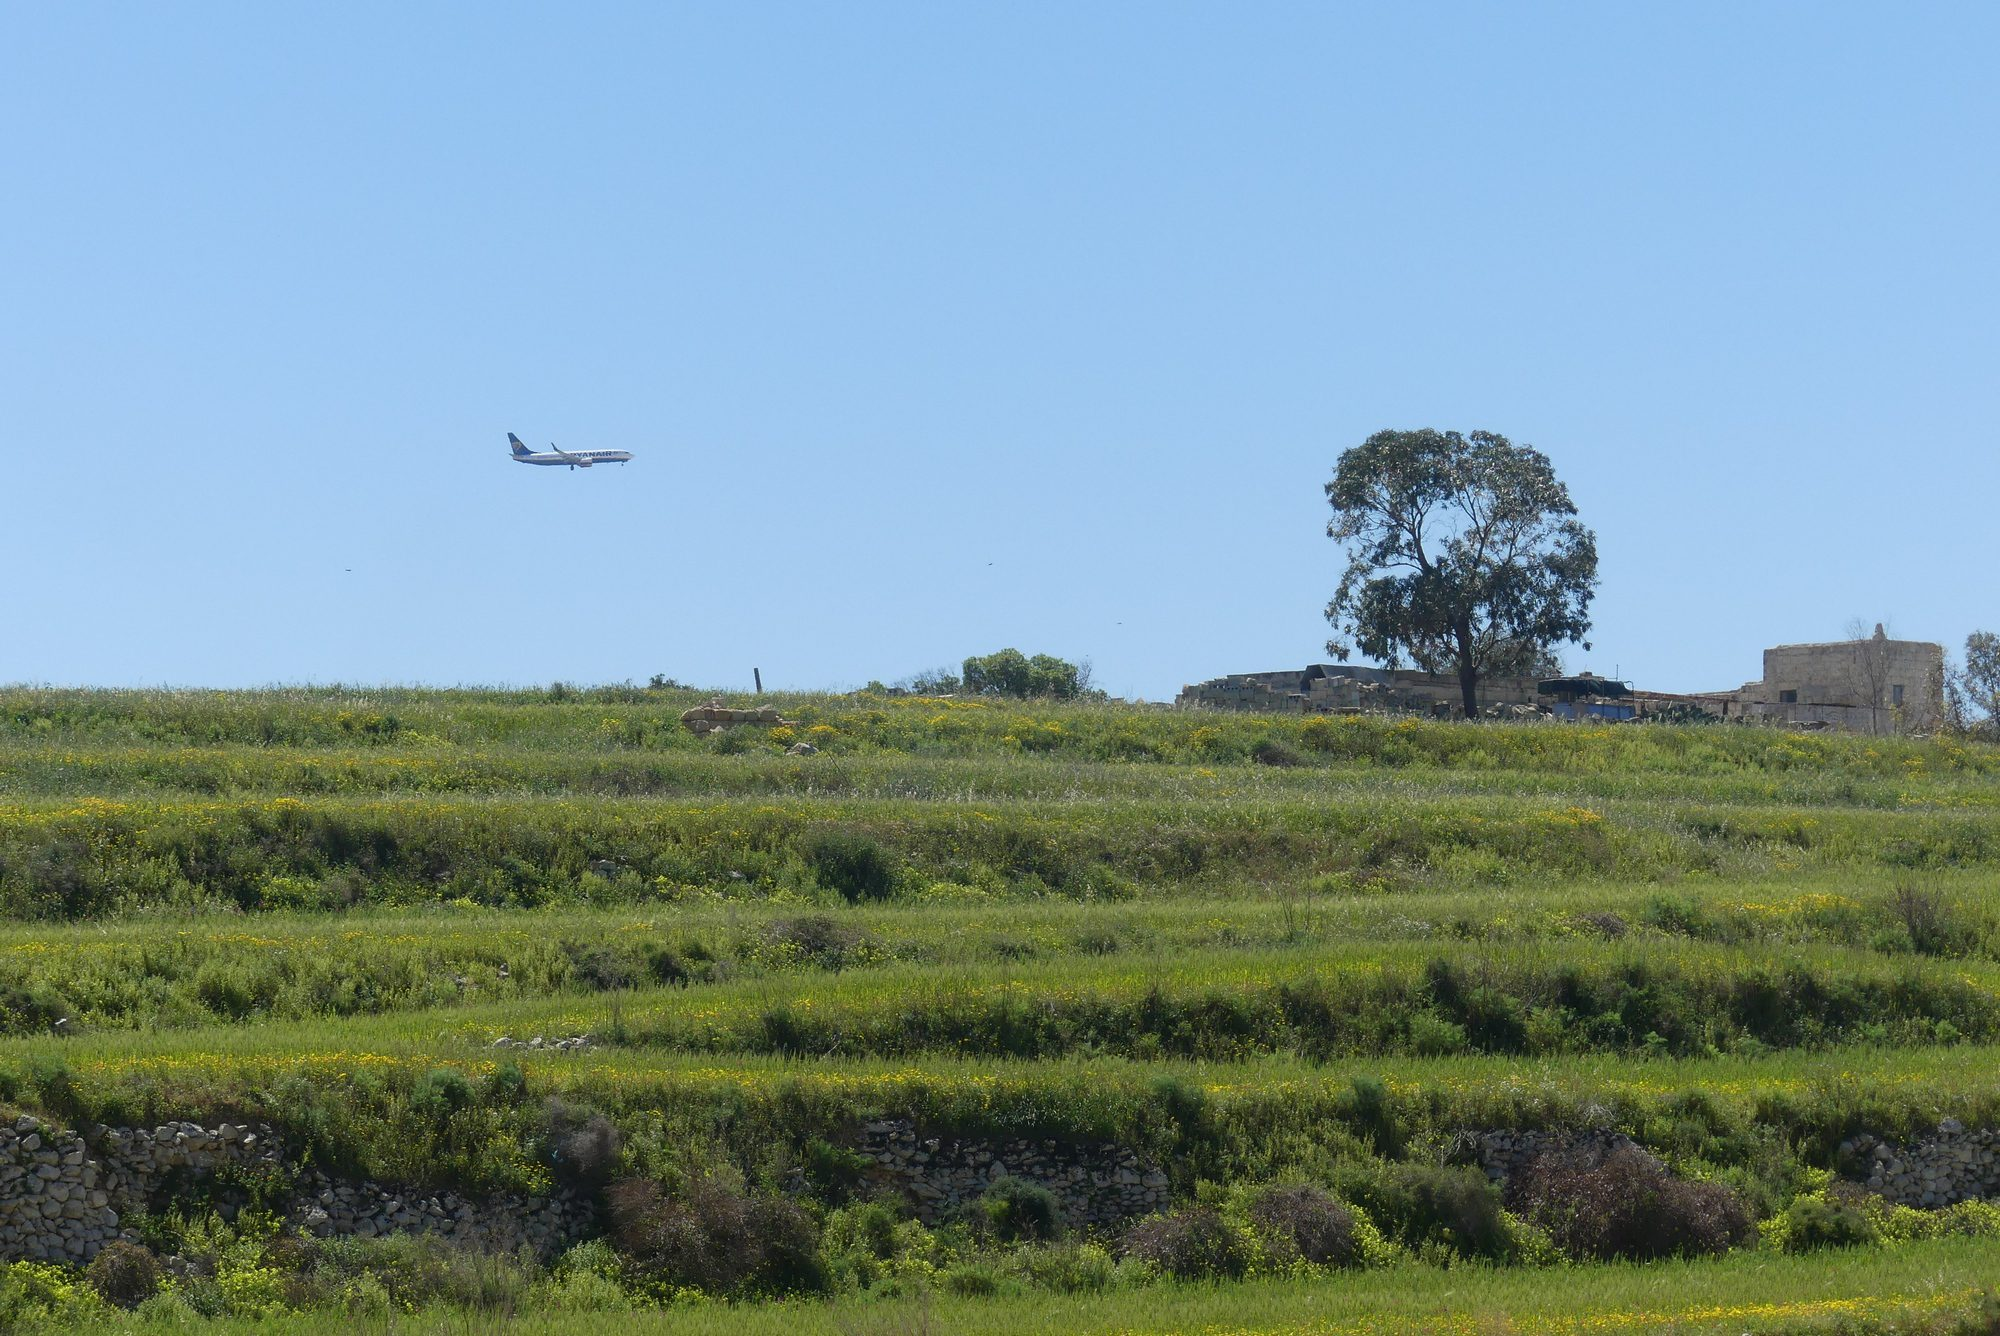 Flugzeug im Landeanflug auf Malta